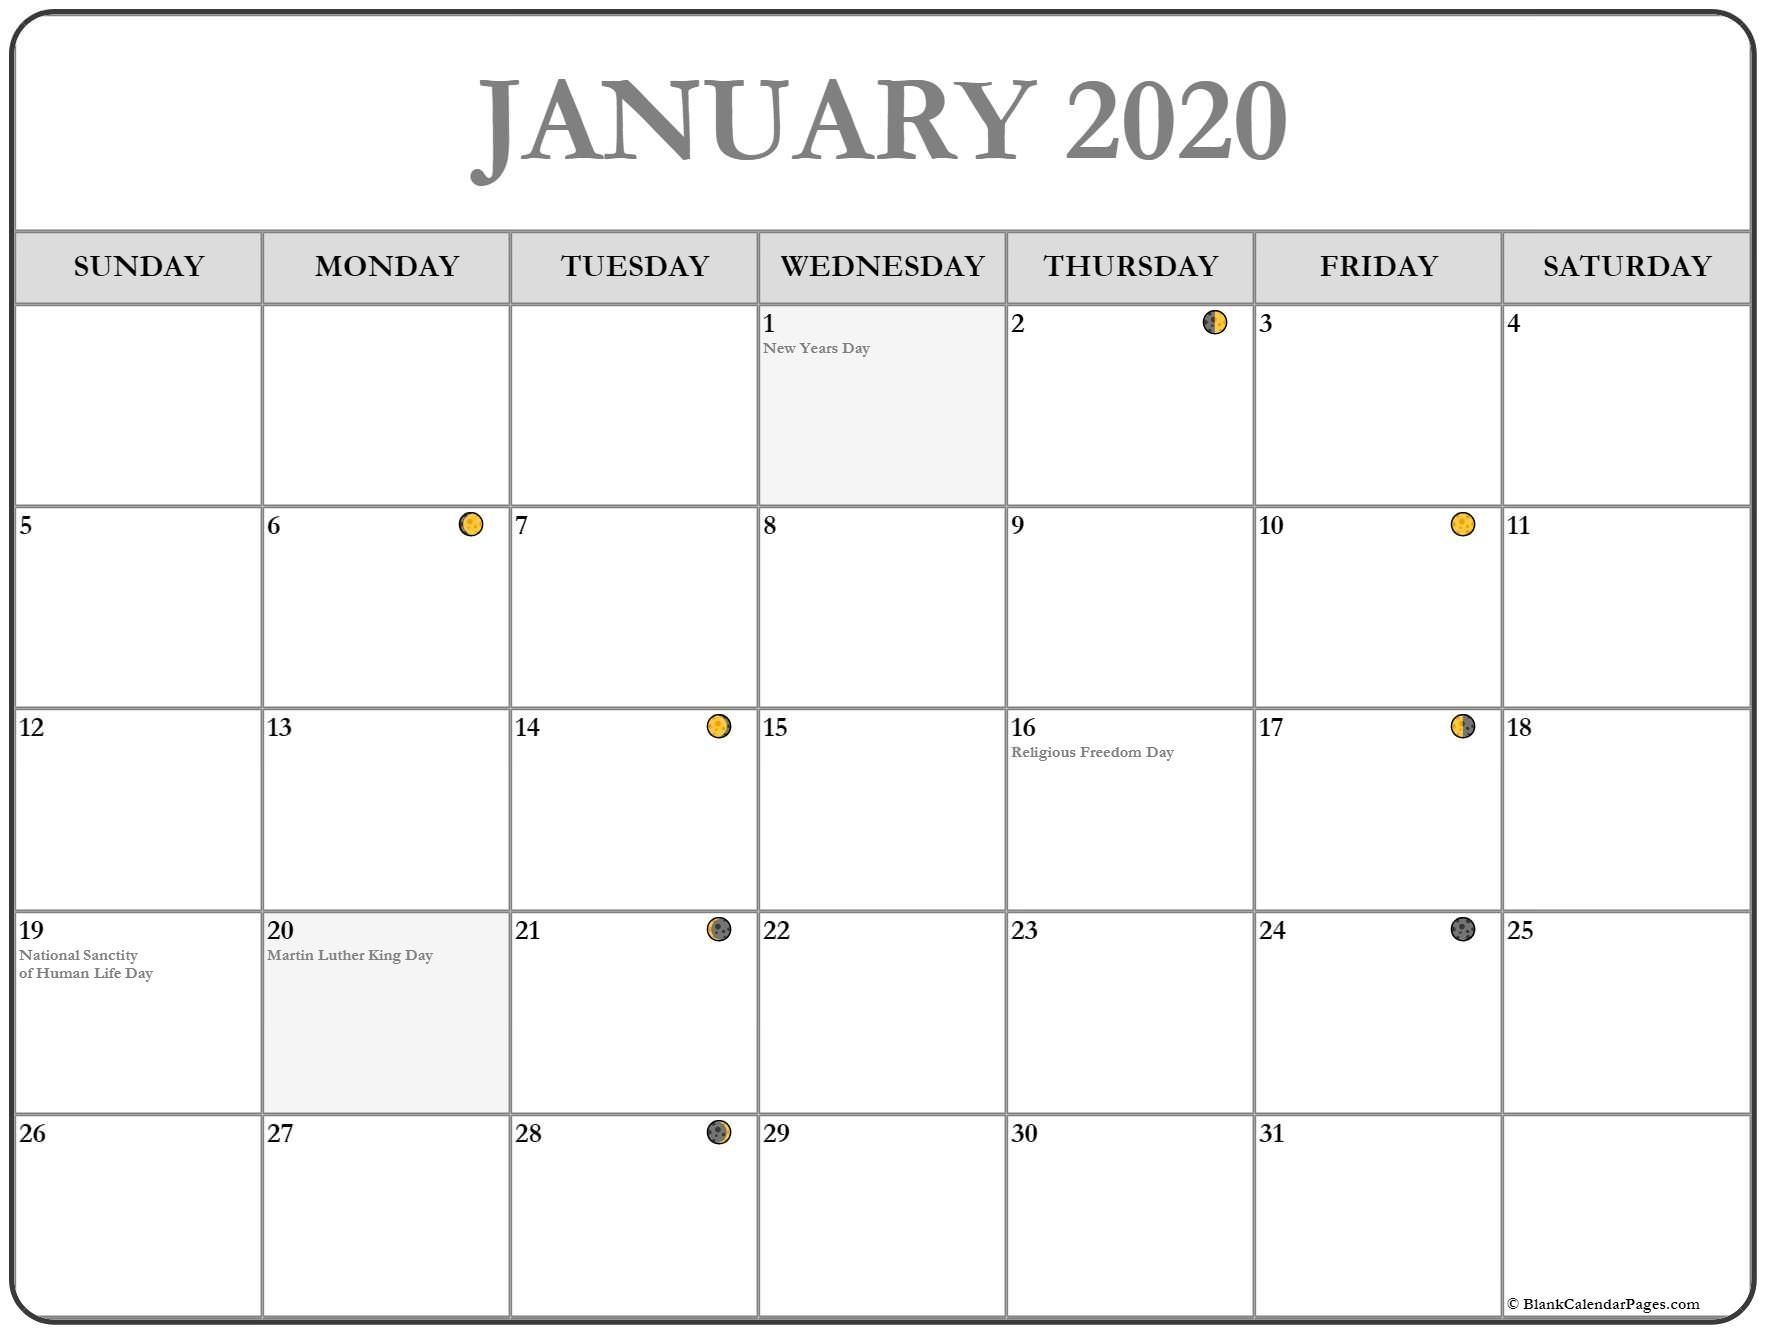 January 2020 Calendar Moons Printable January 2020 Moon Calendar #january #january2020